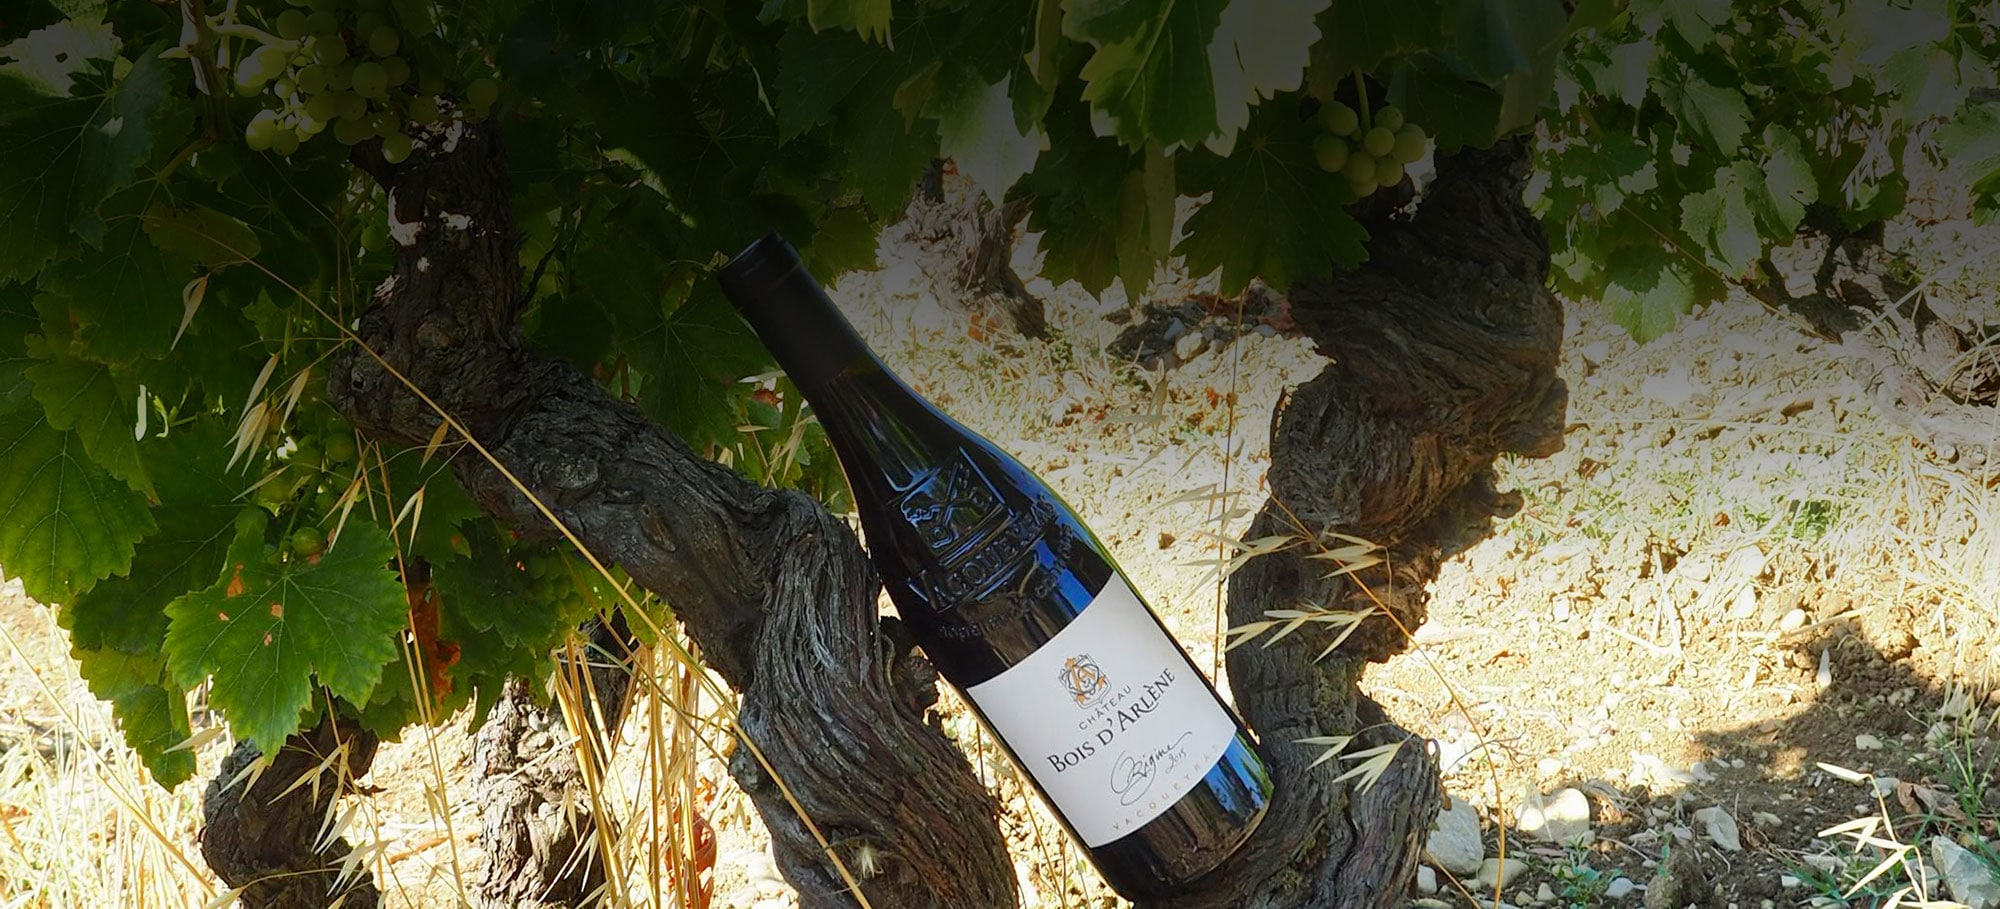 vin, chateau bois d'arlene, vacqueyras, cote du rhone